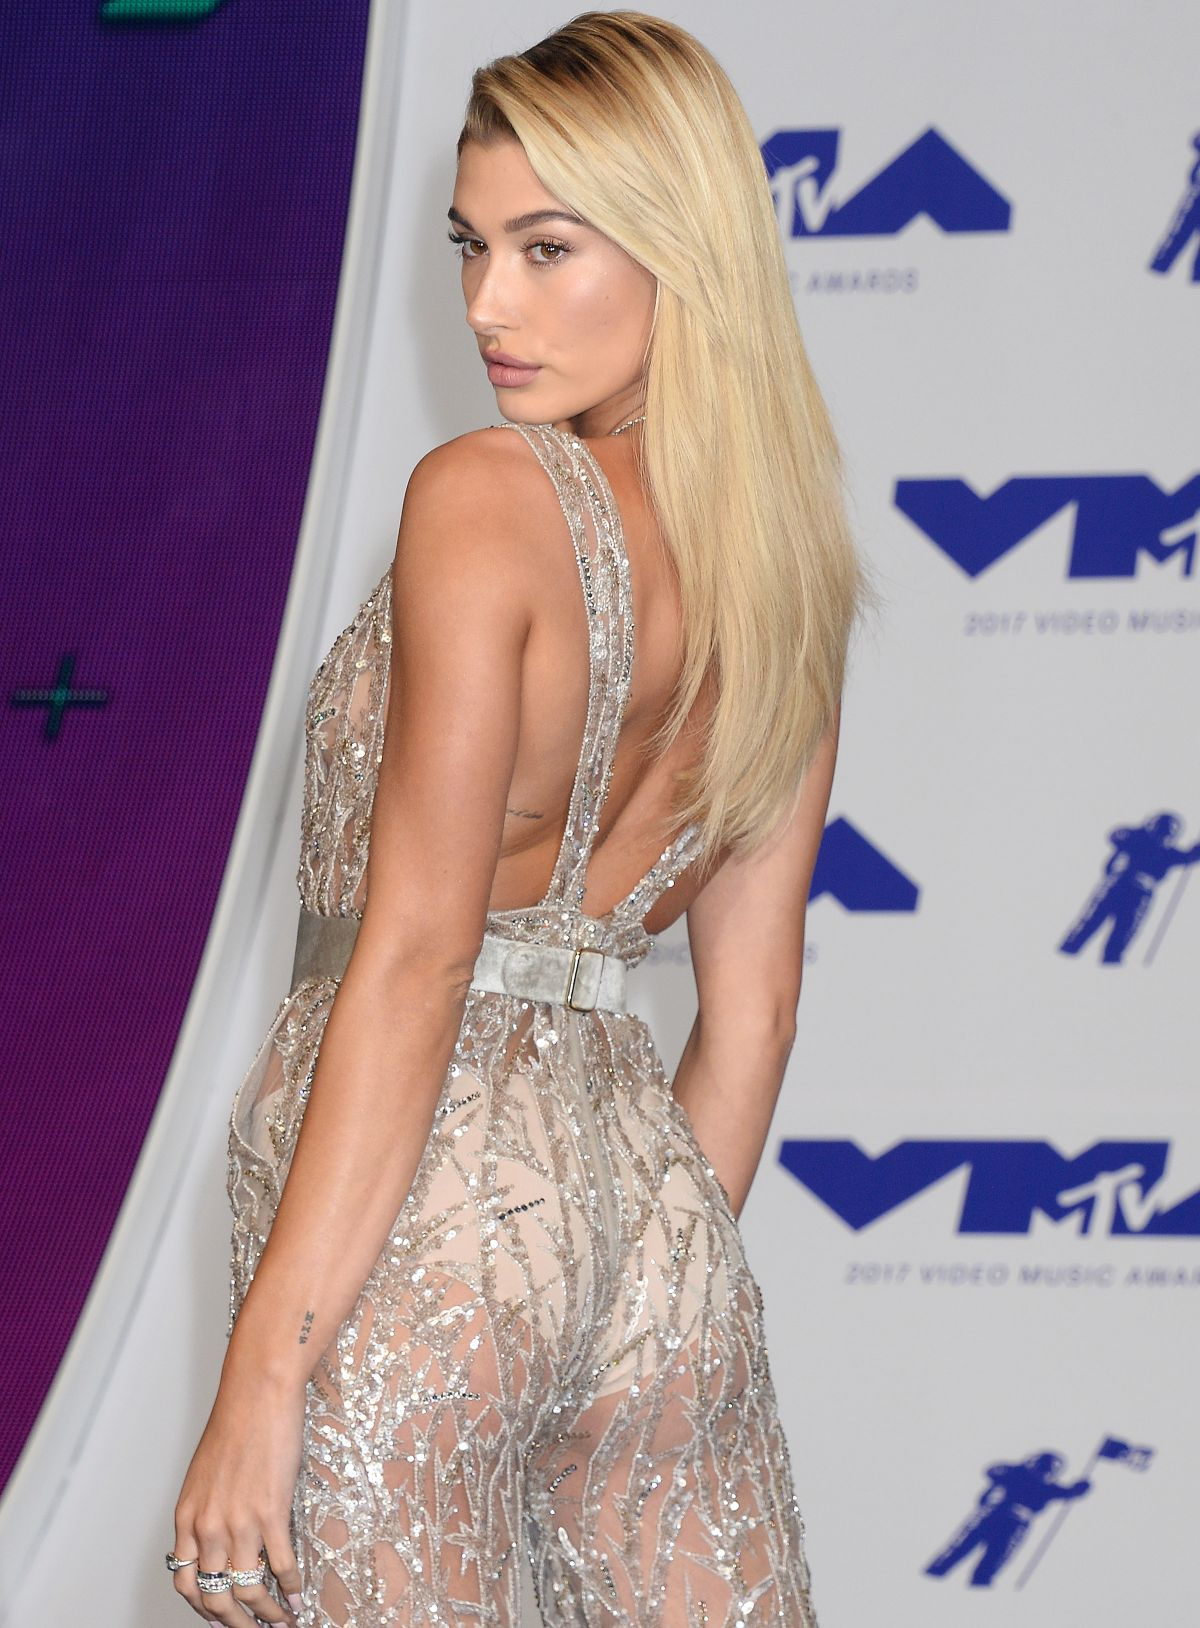 HAILEY BALDWIN at 2017 MTV Video Music Awards in Los Angeles 08/27/2017